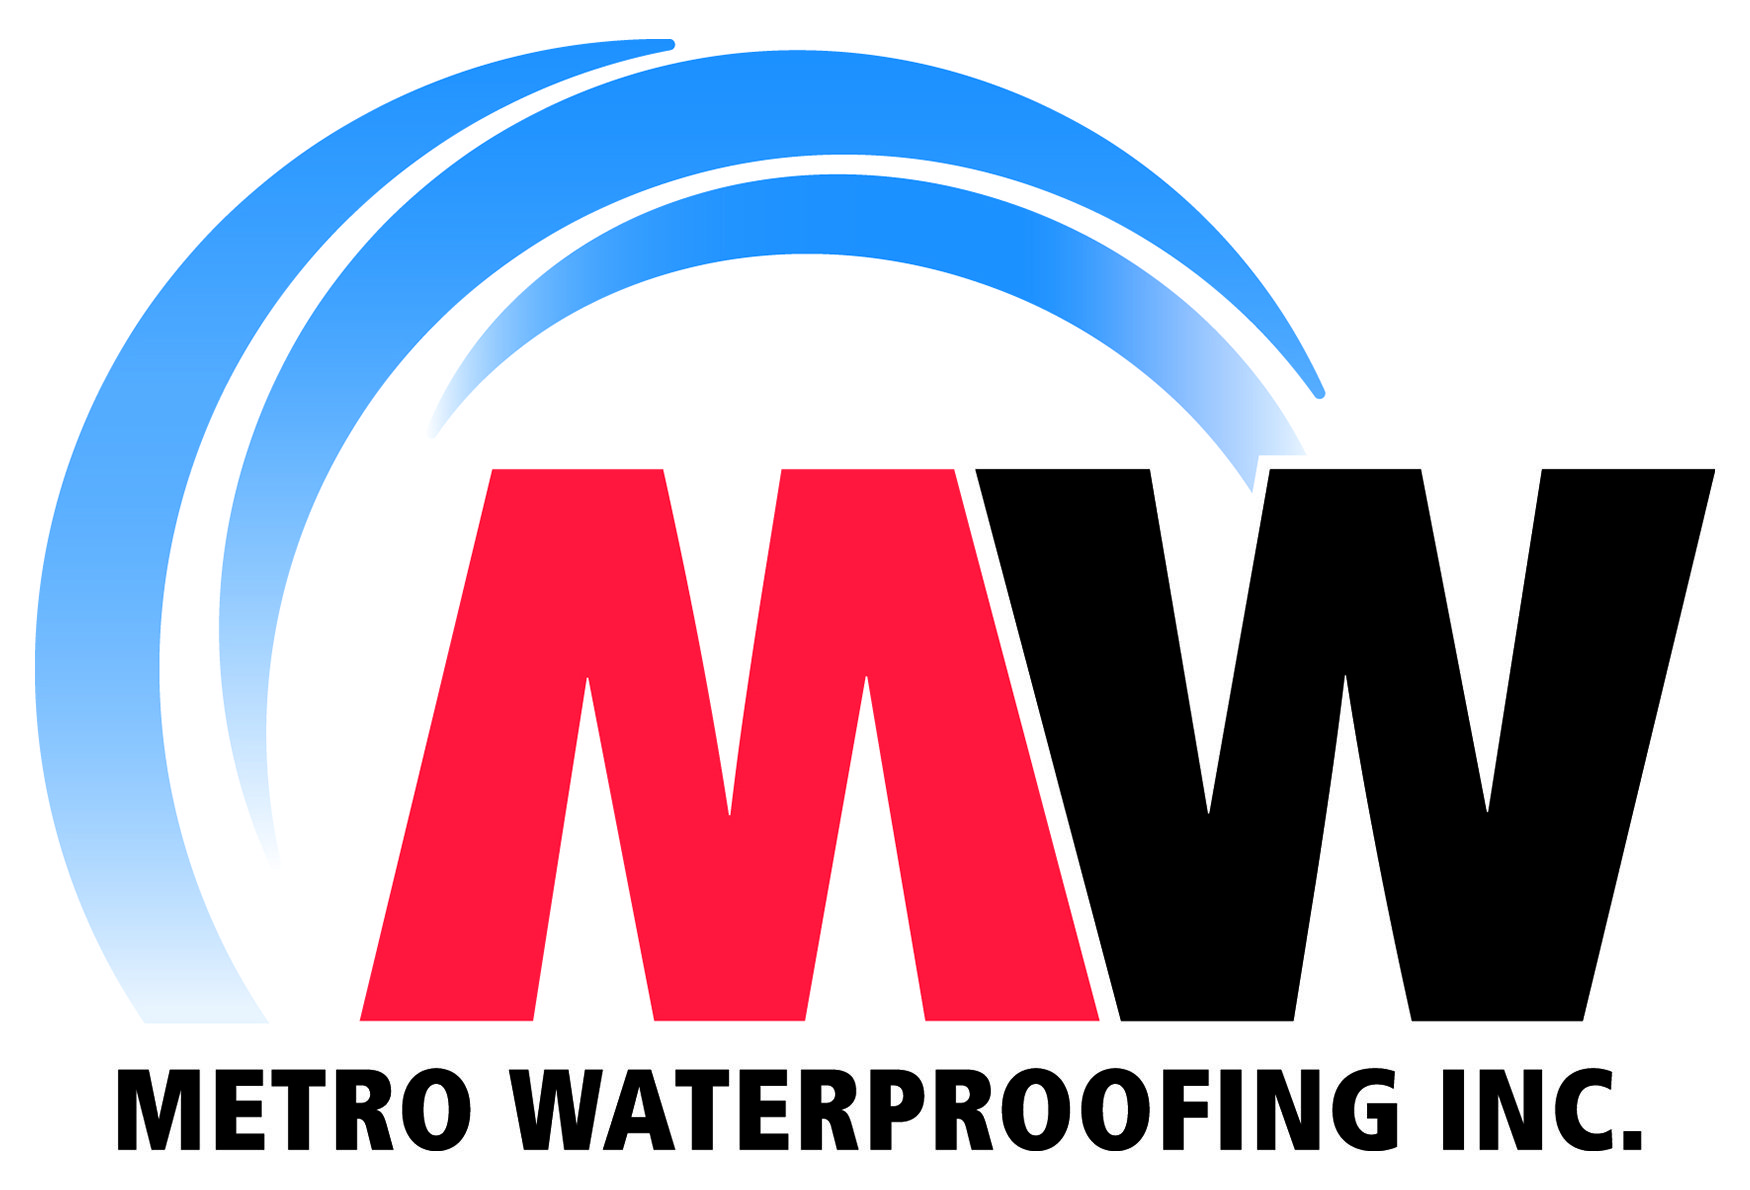 mtro_waterproofing_decals_SM